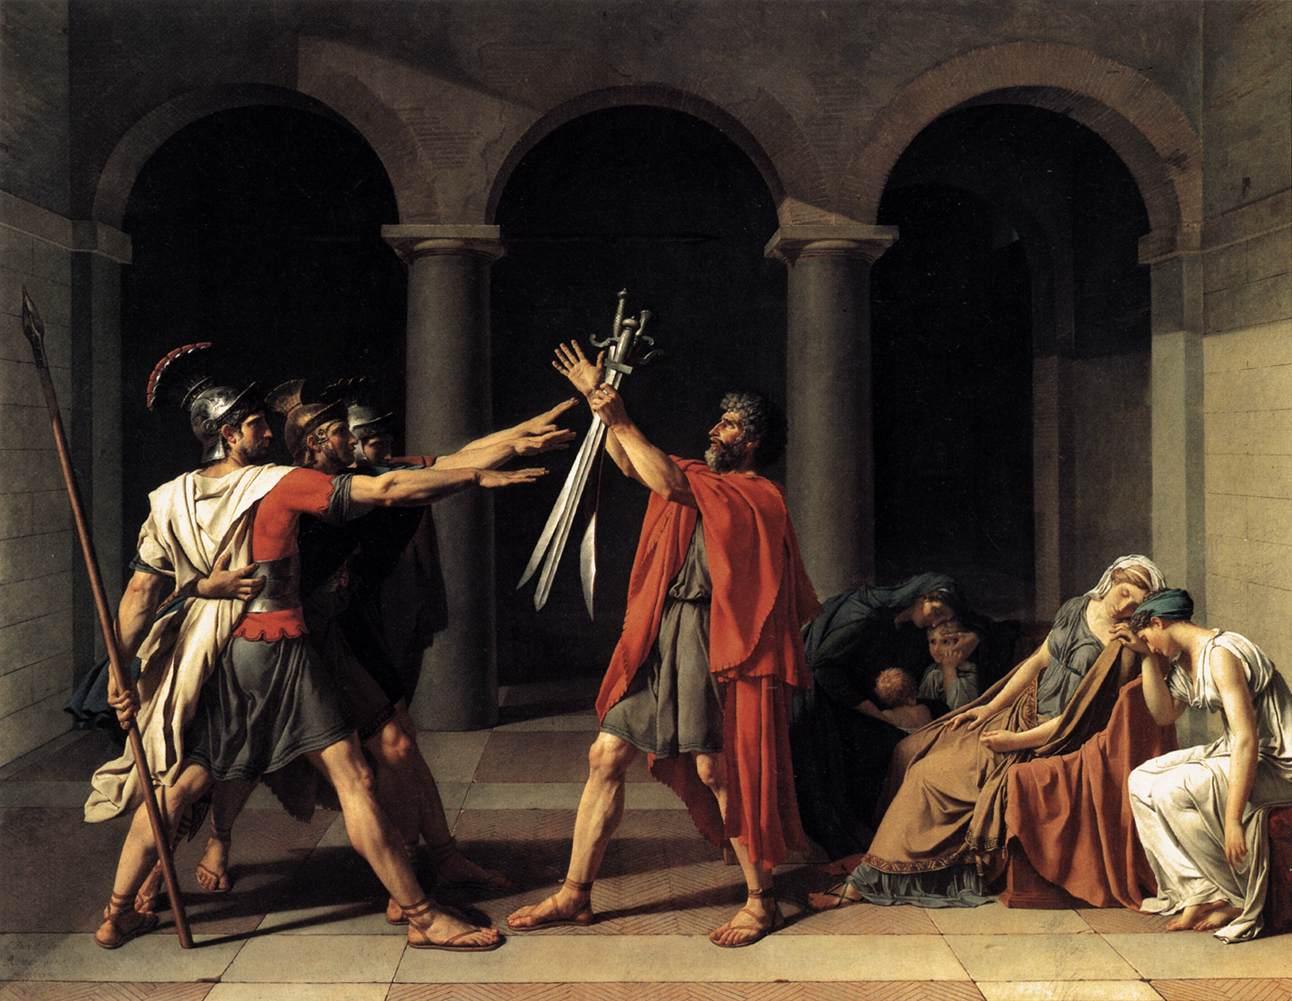 Римский салют. Клятва Горациев (1784), Жак Луи Давид